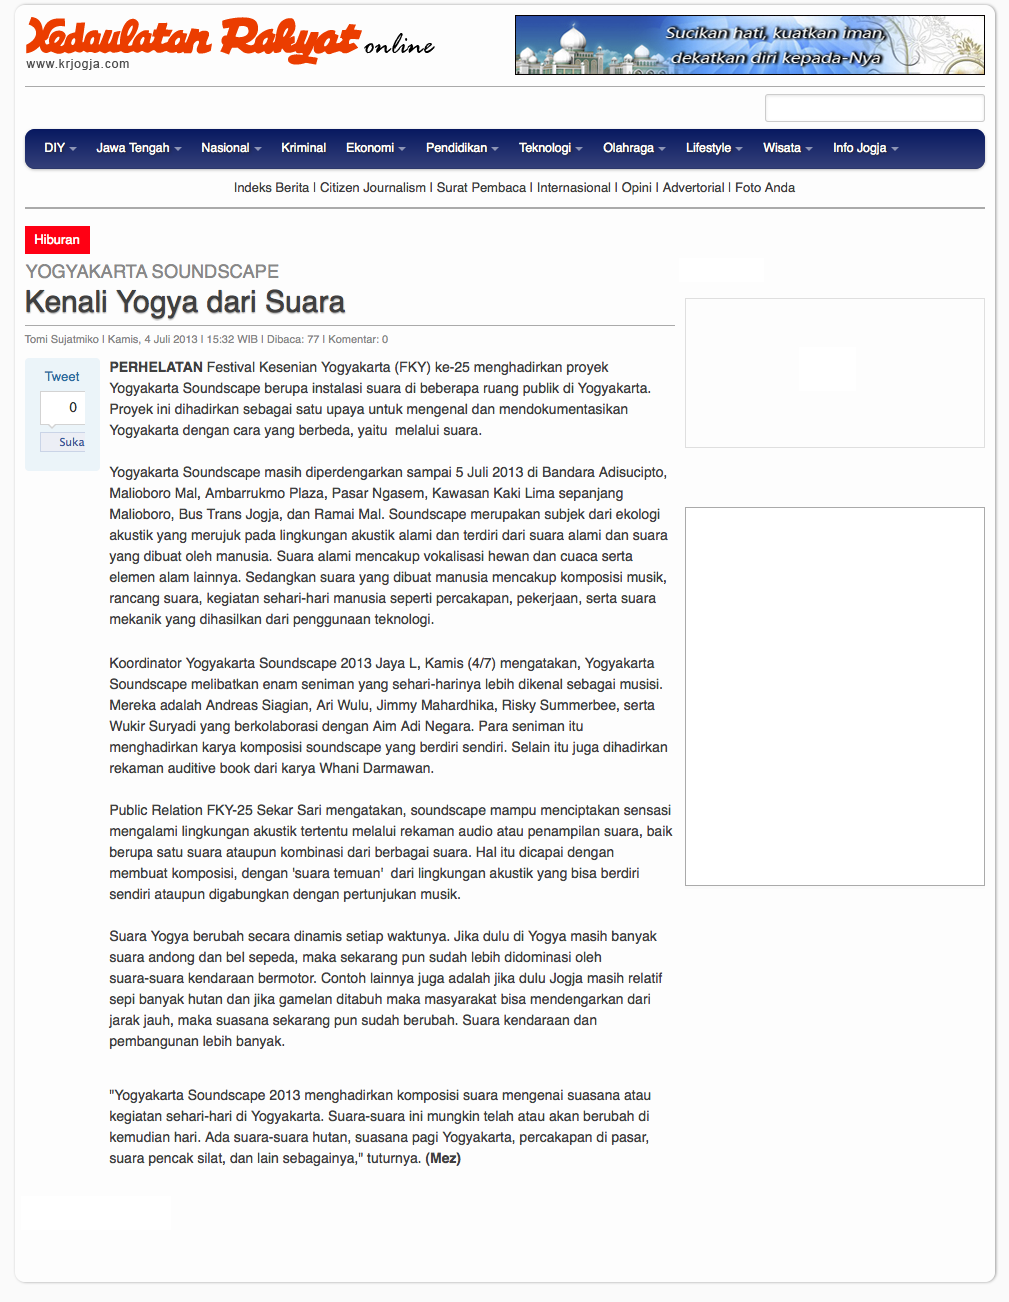 Yogyakarta Soundscape In Festival Kesenian Yogyakarta 2013 Article